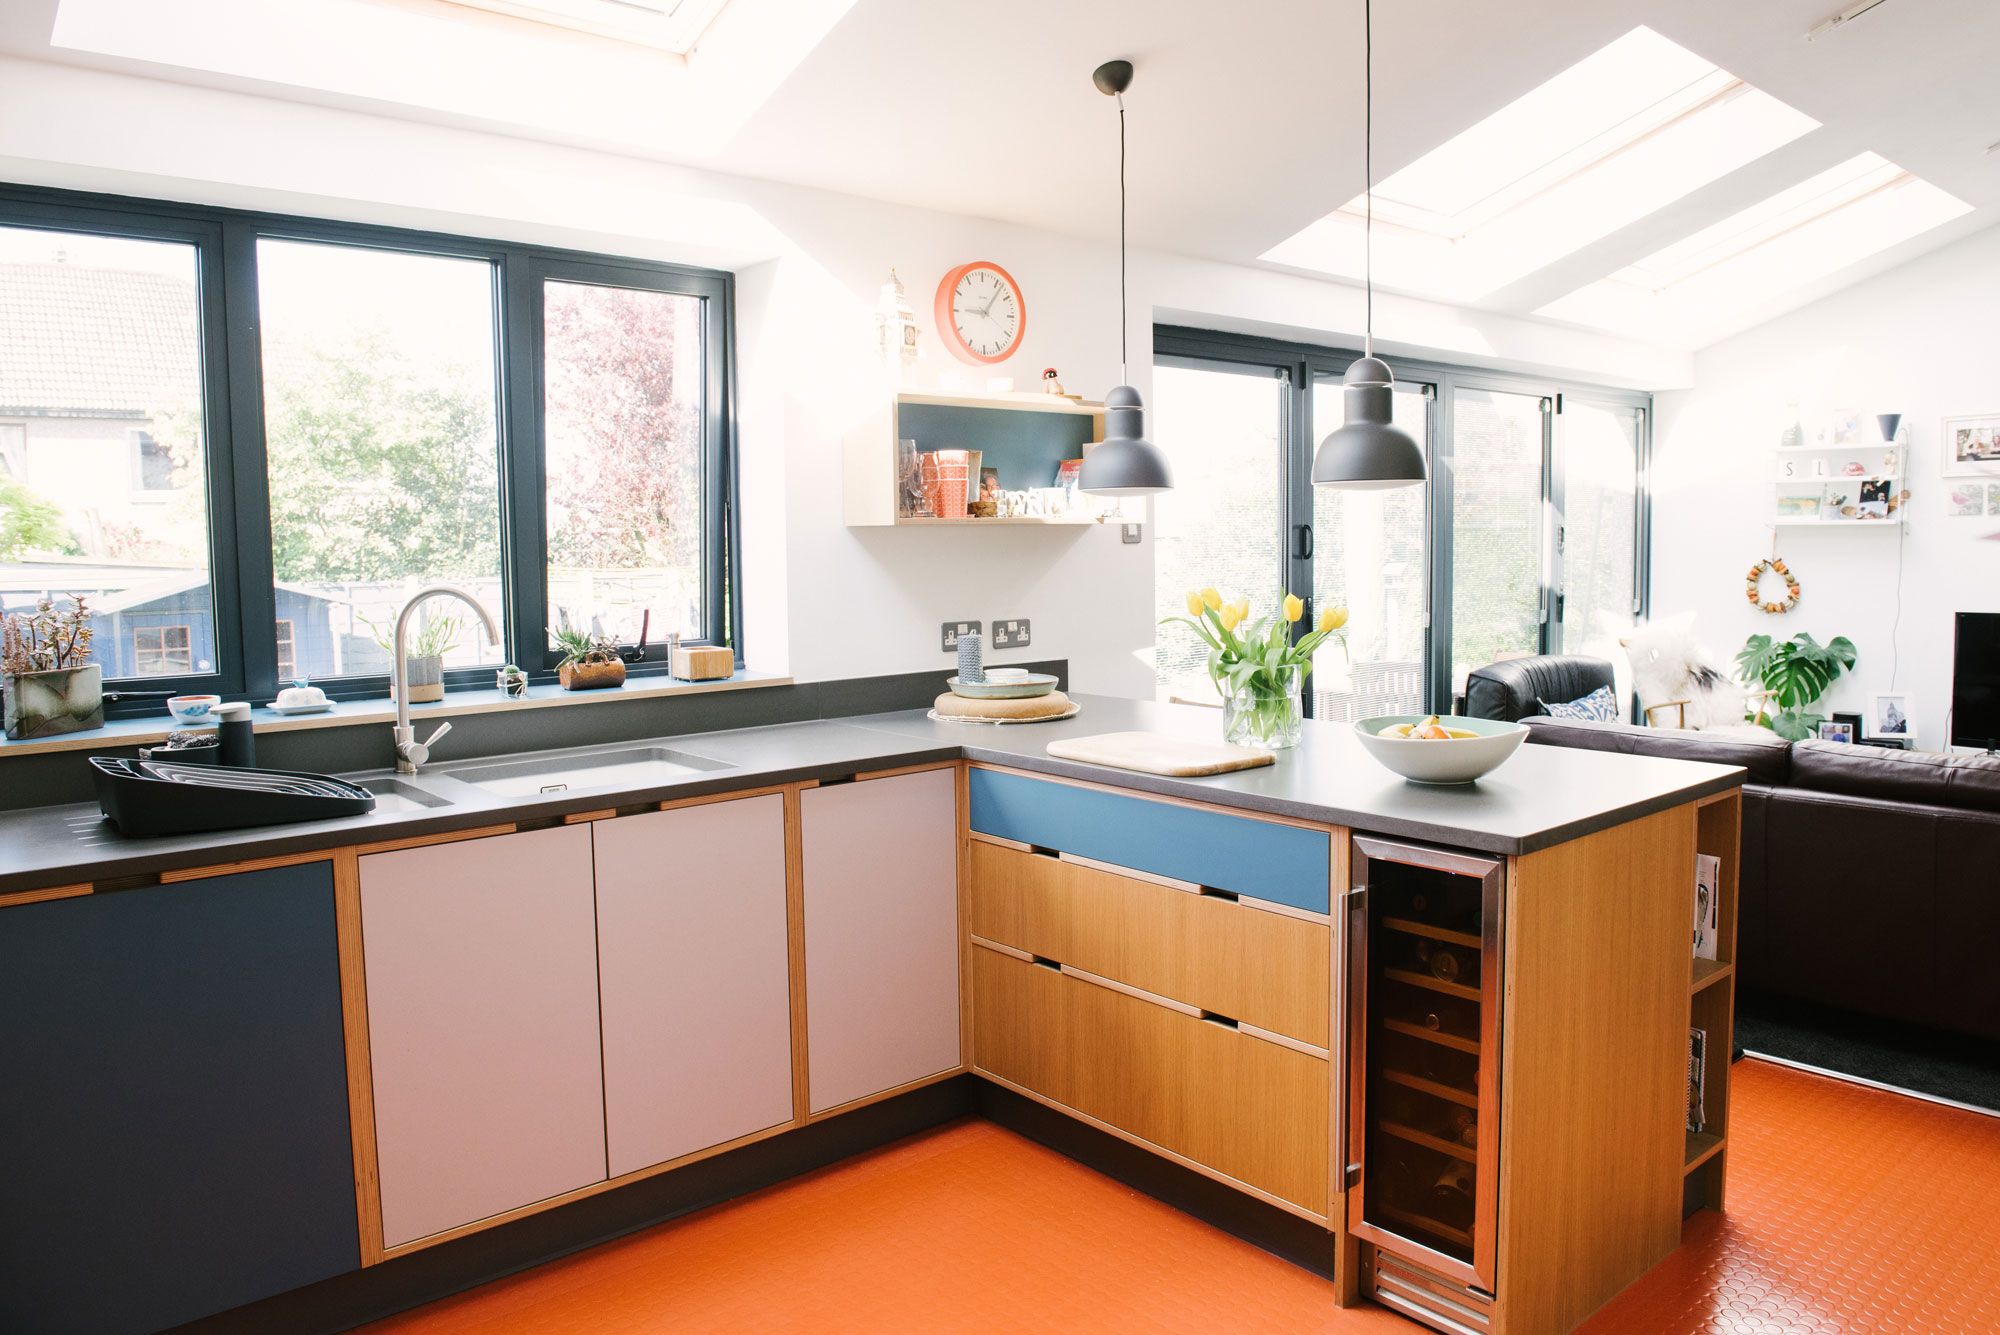 Plywood Kitchen With Orange Floor Showing Wine Fridge